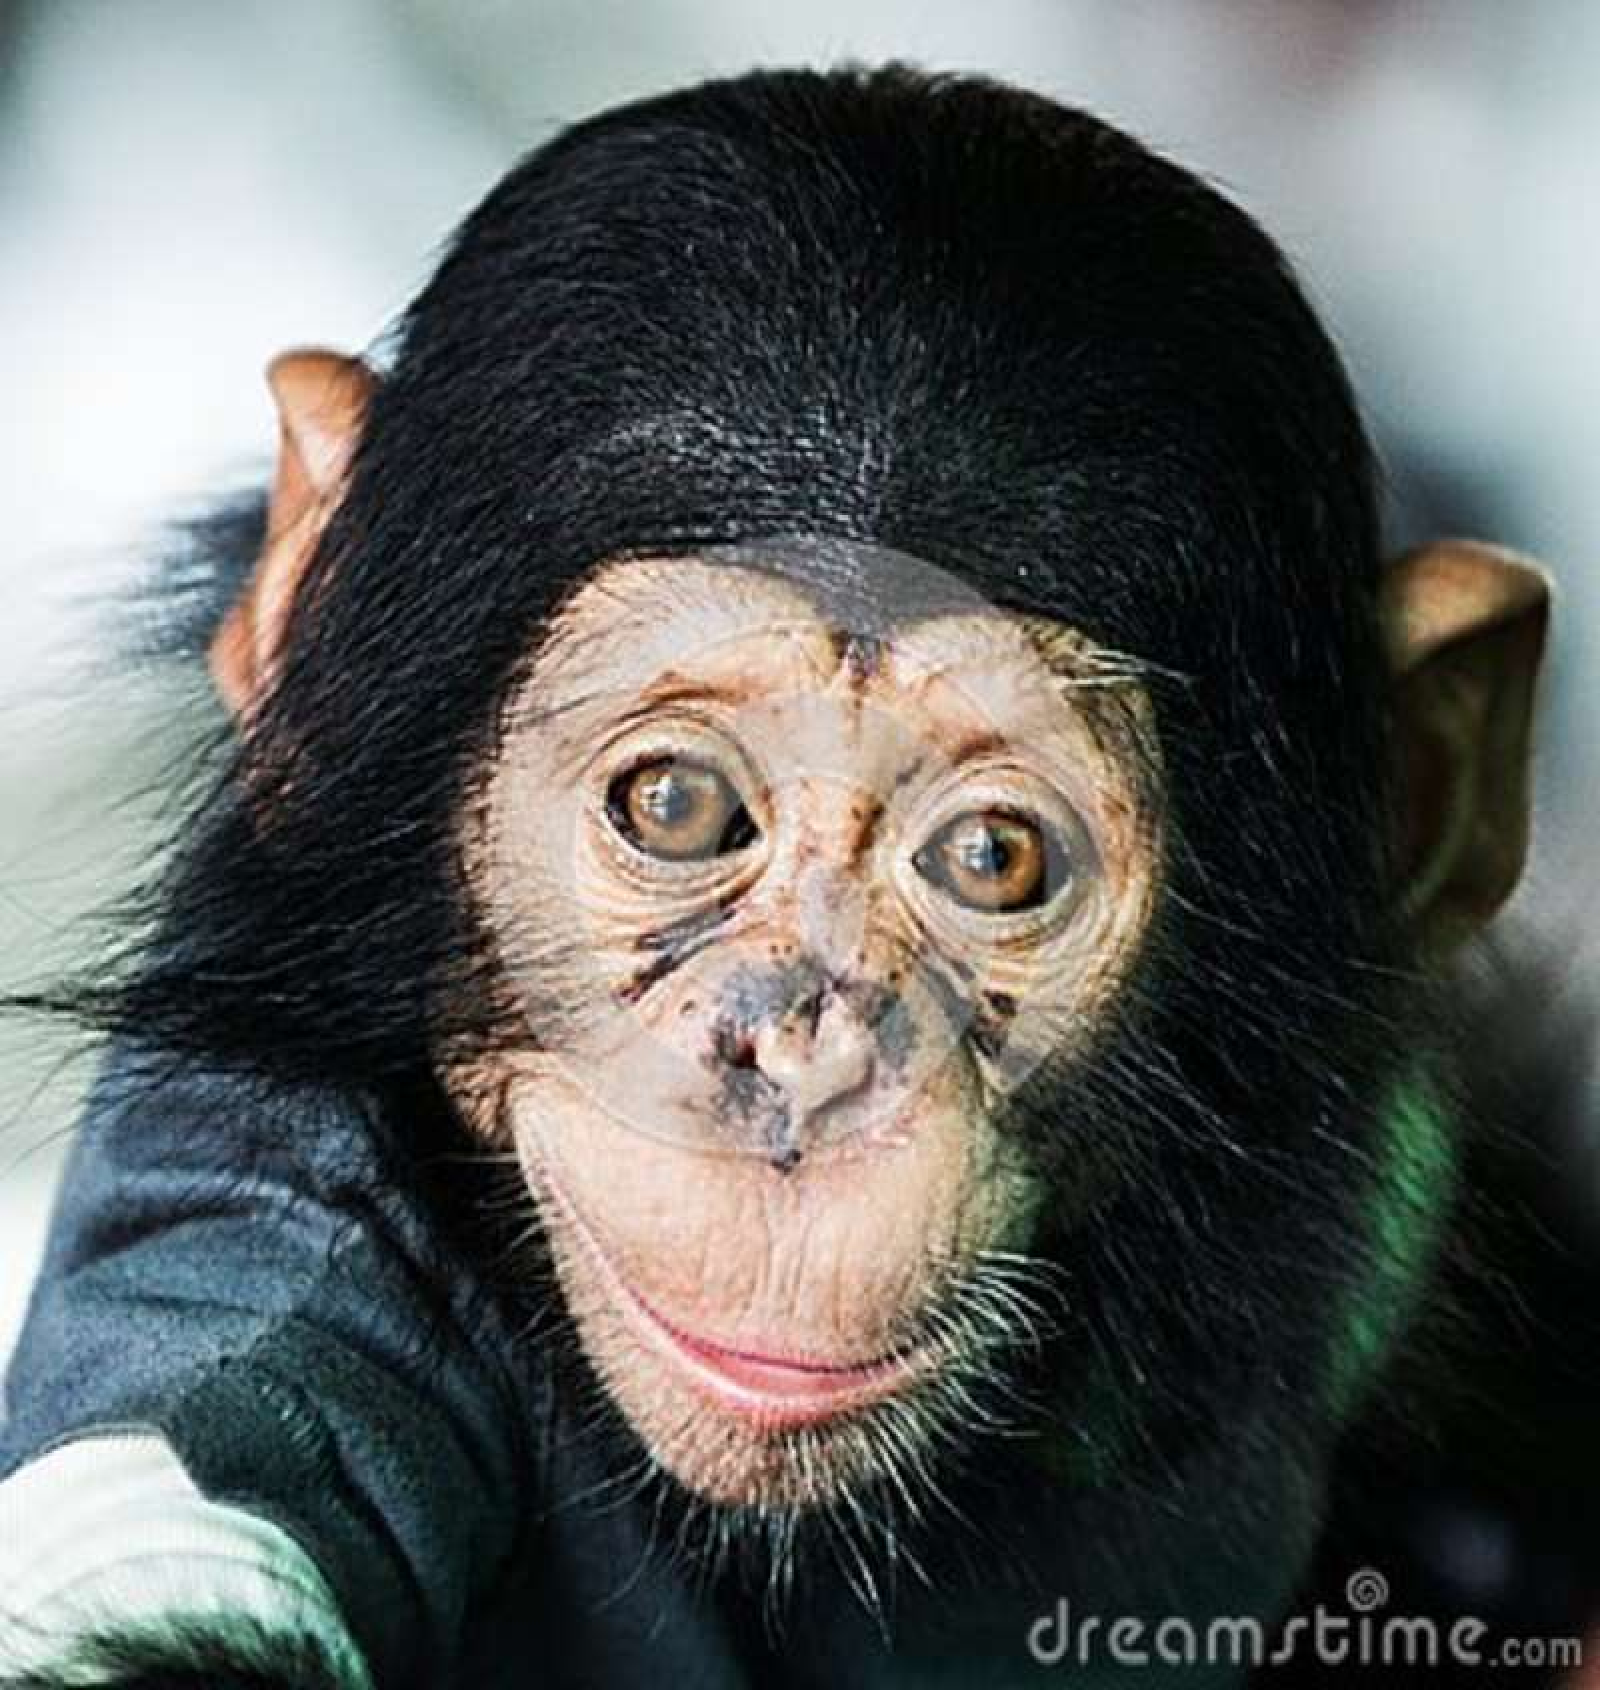 Chimpanzee Baby Stock Image - Image: 38162711